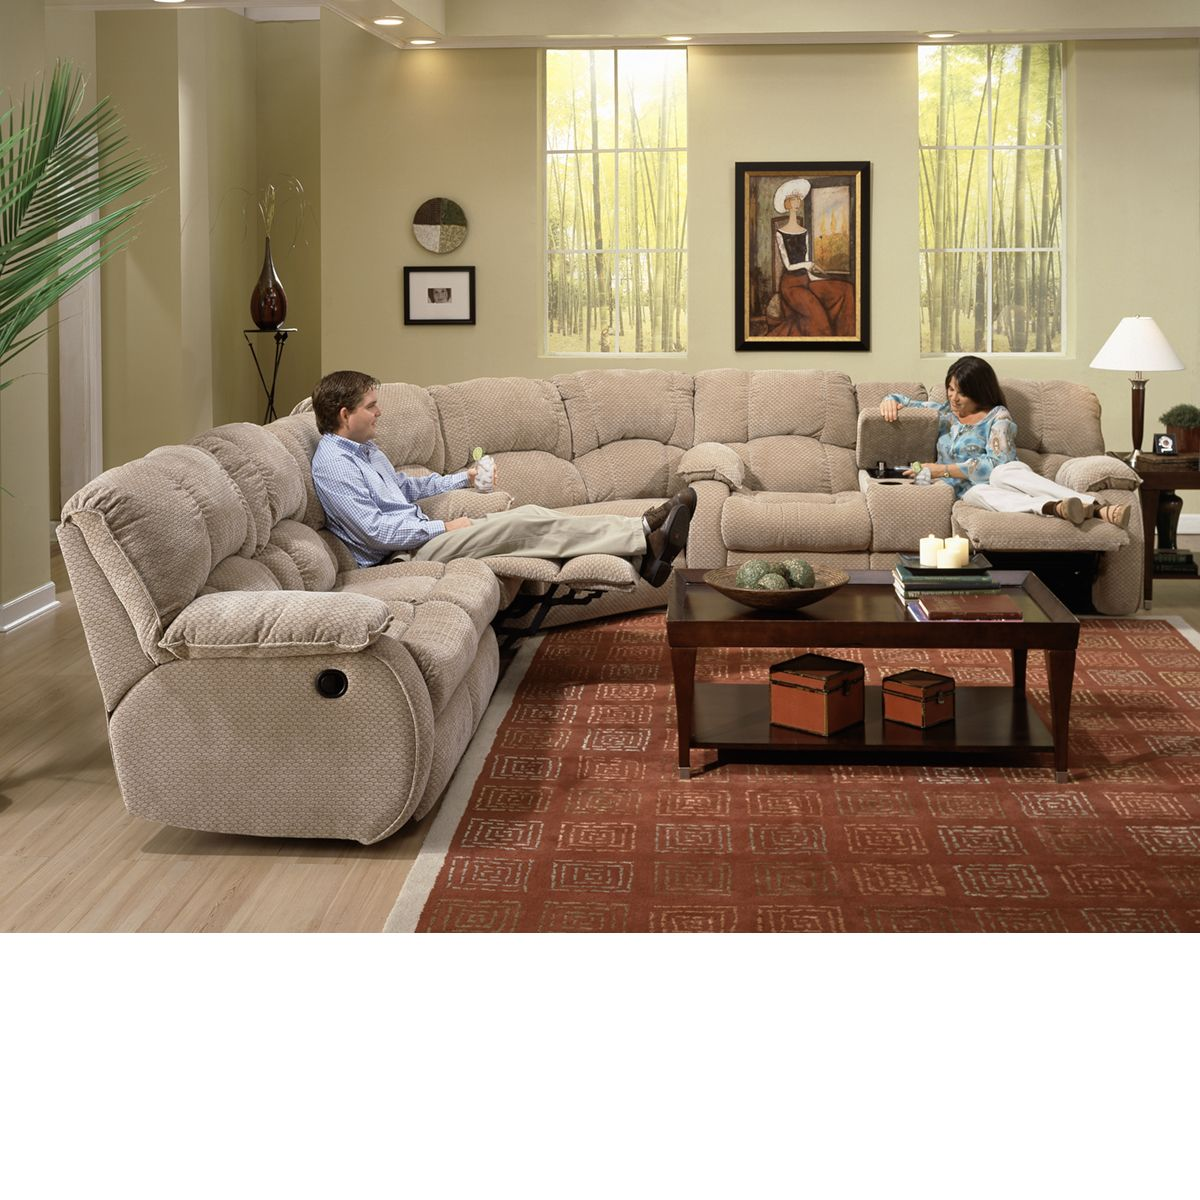 The Dump Furniture   DUAL RECLINING MICROFIBER SOFA